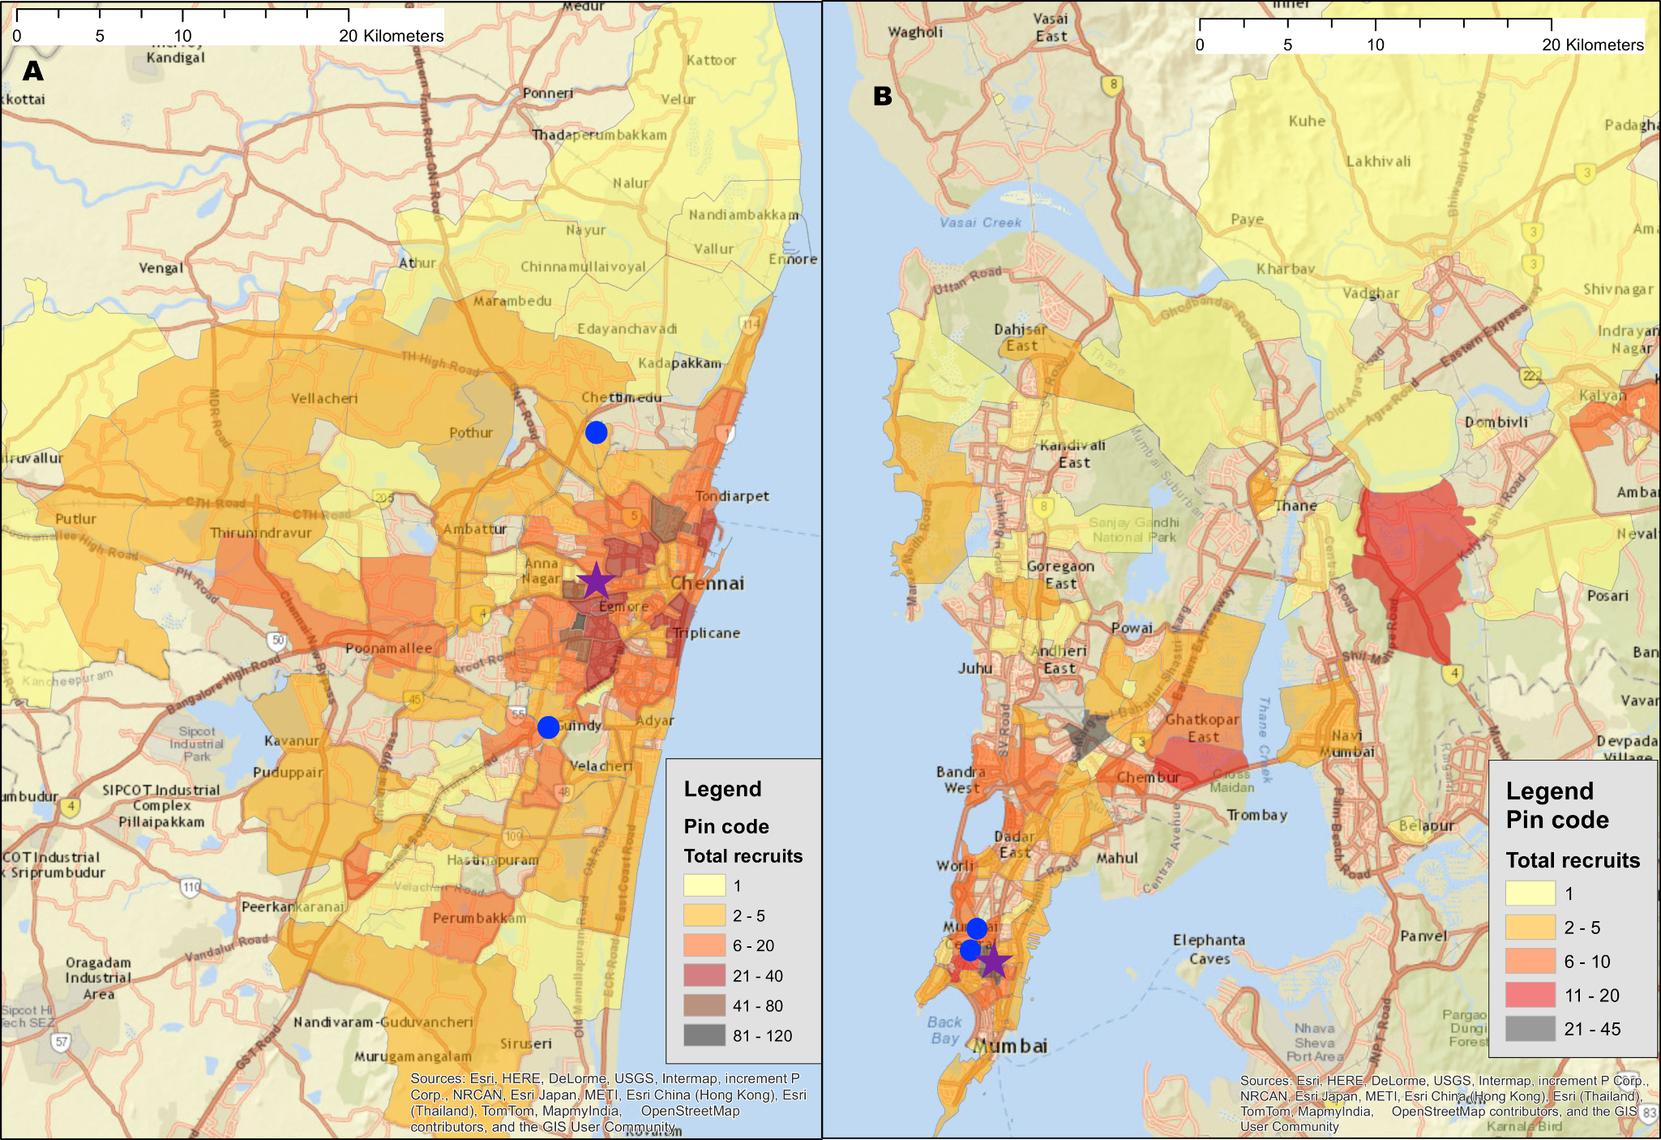 Recruitment of participants across a city using respondent-driven sampling.